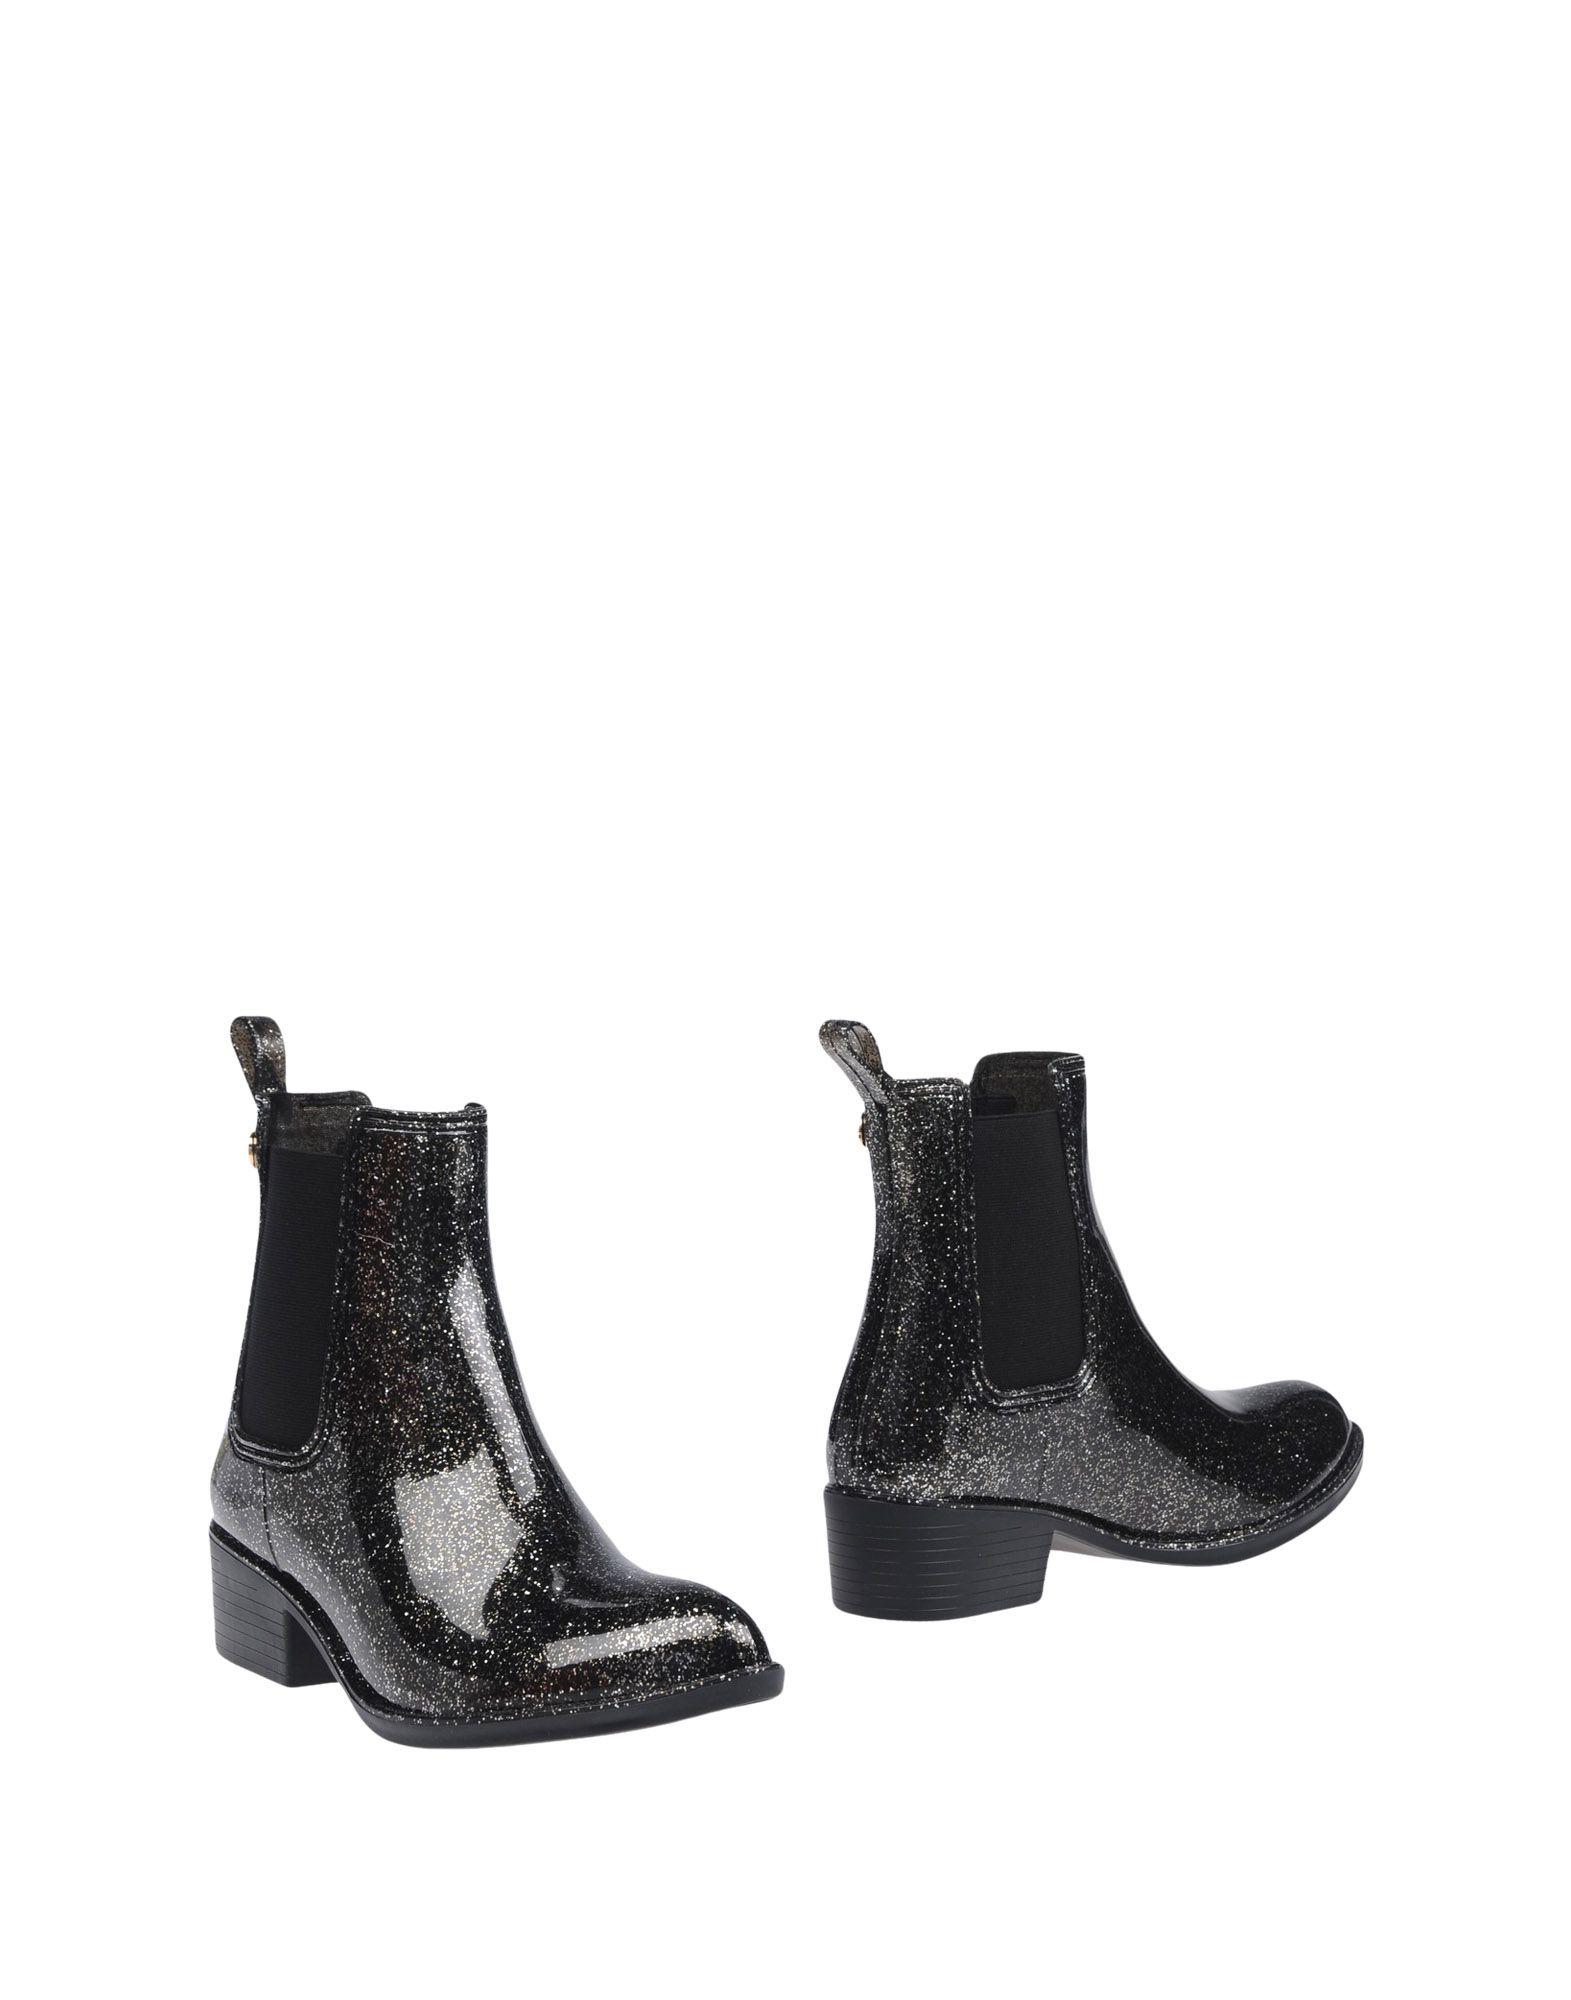 GIOSEPPO Полусапоги и высокие ботинки magazzini del sale полусапоги и высокие ботинки